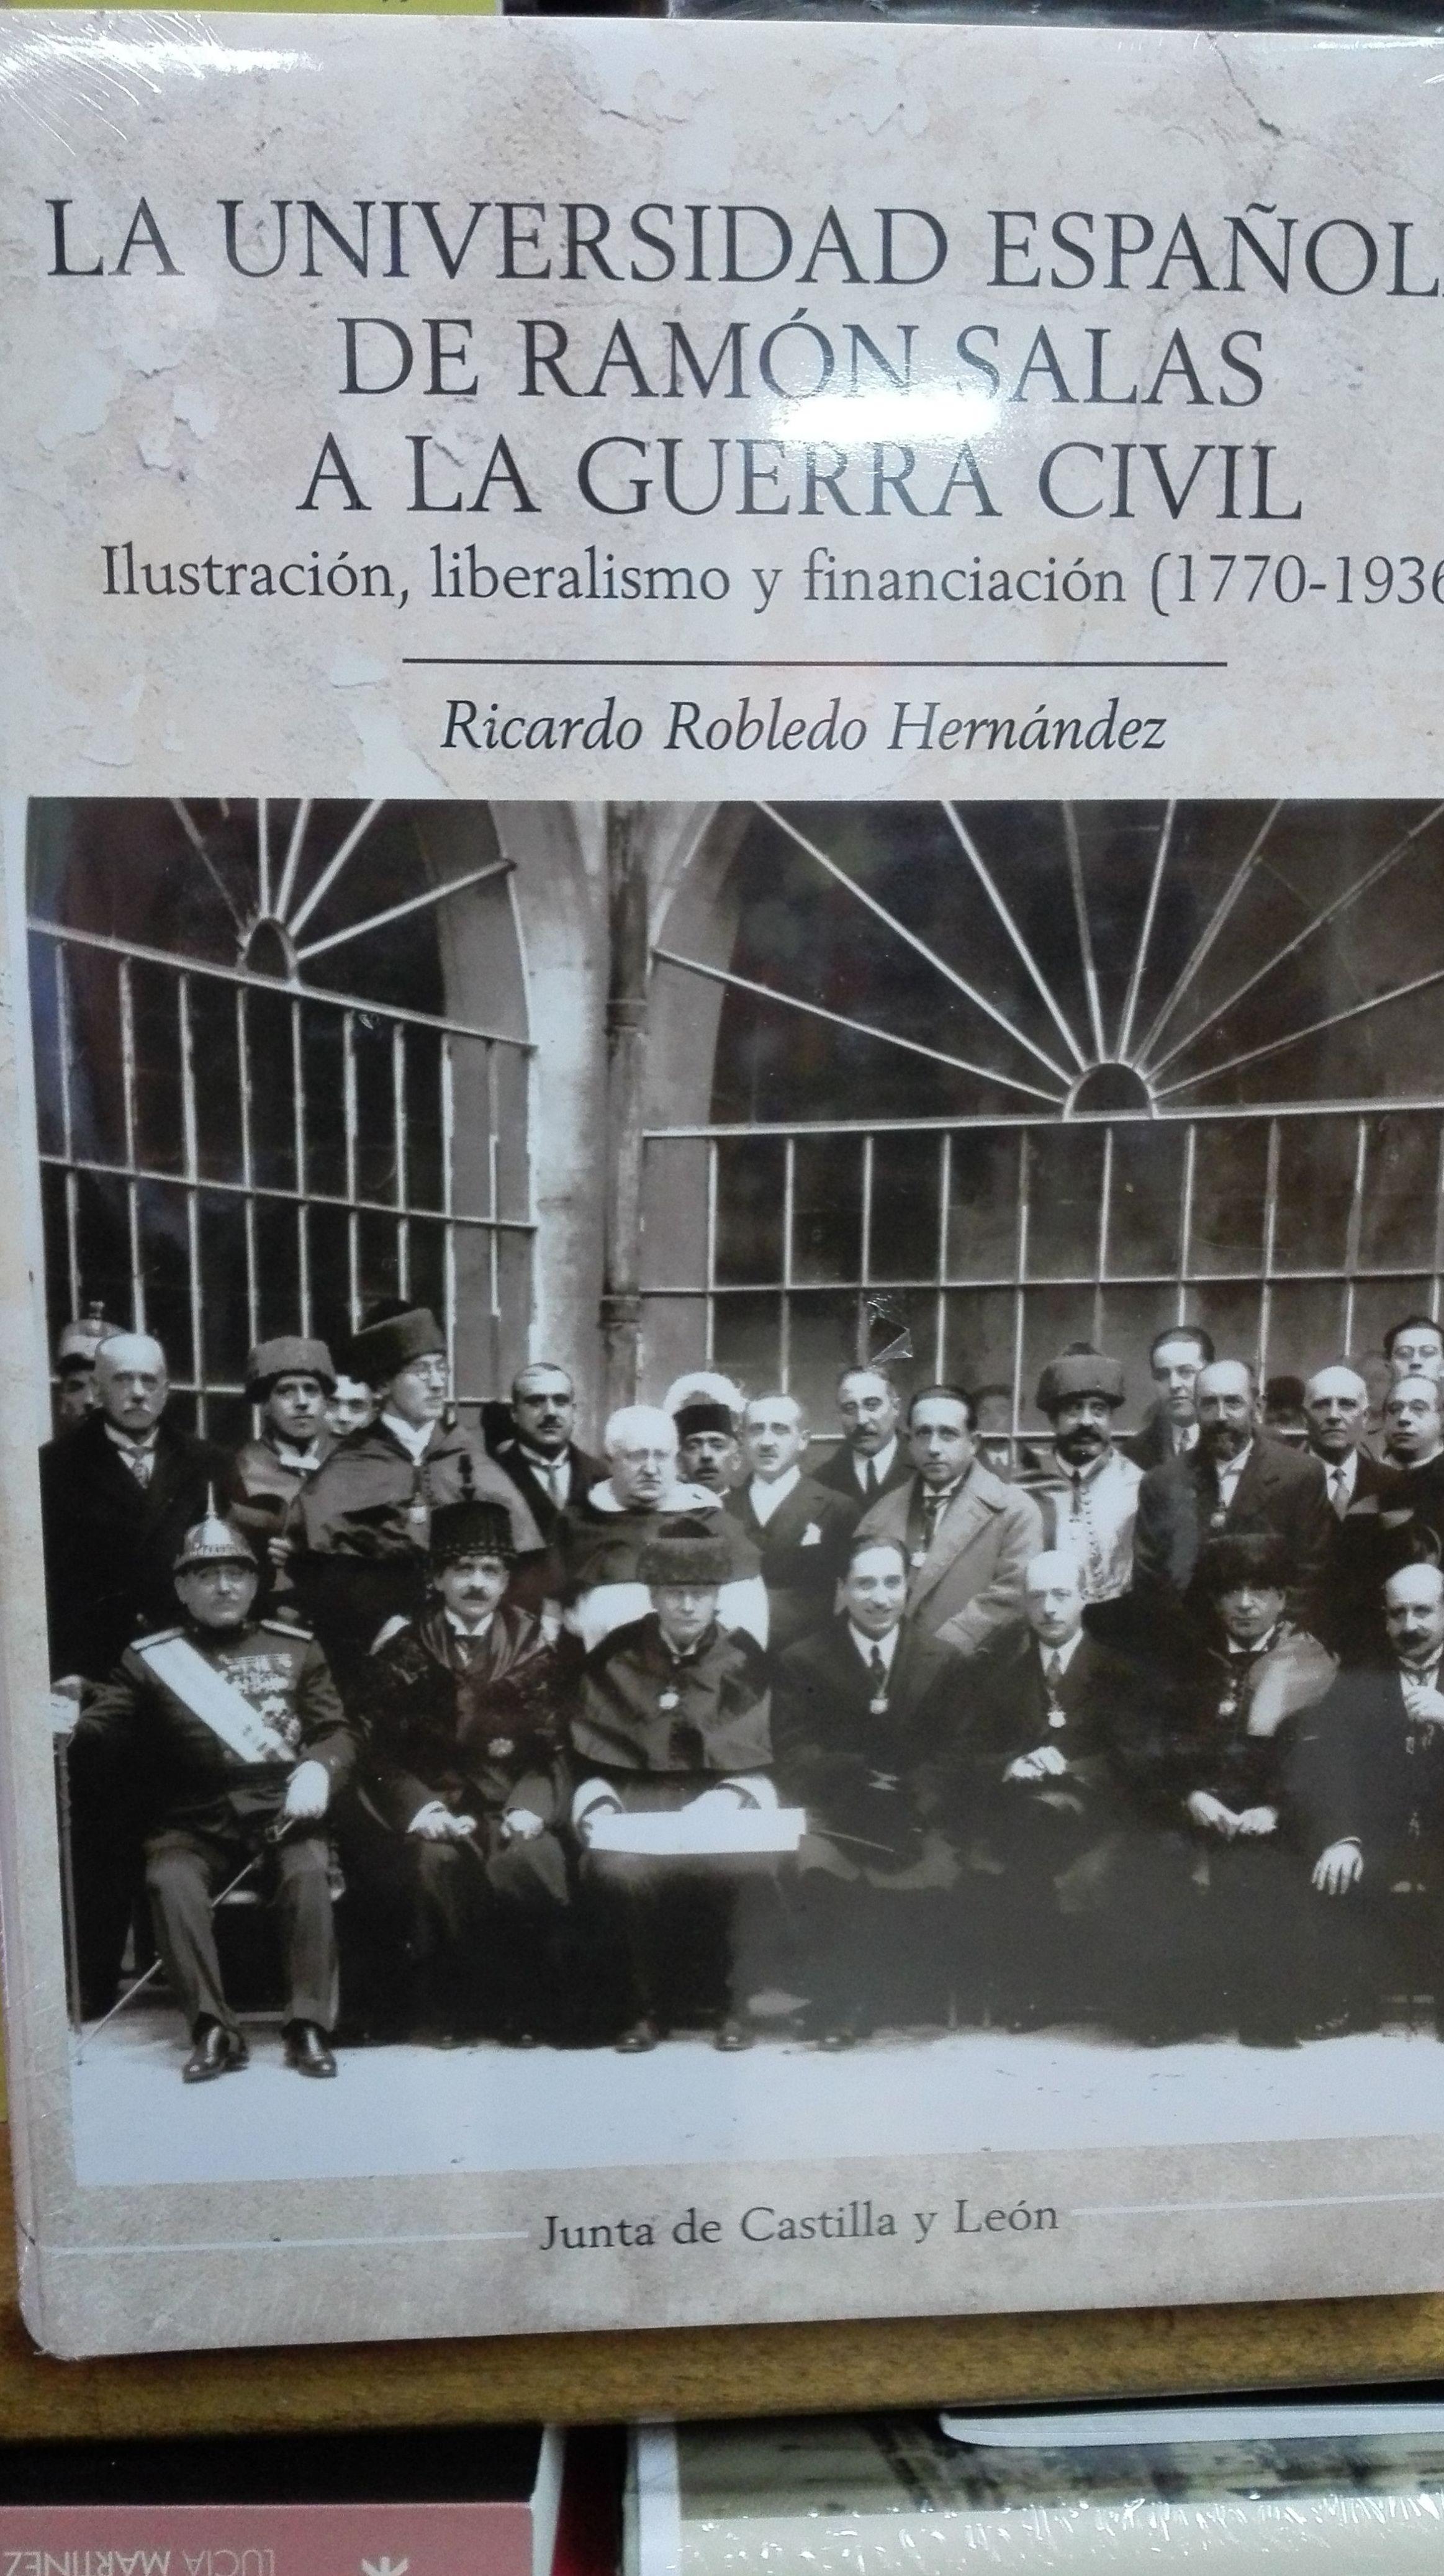 La Universidad Esapñola de Ramon Salas a la Guerra Civil